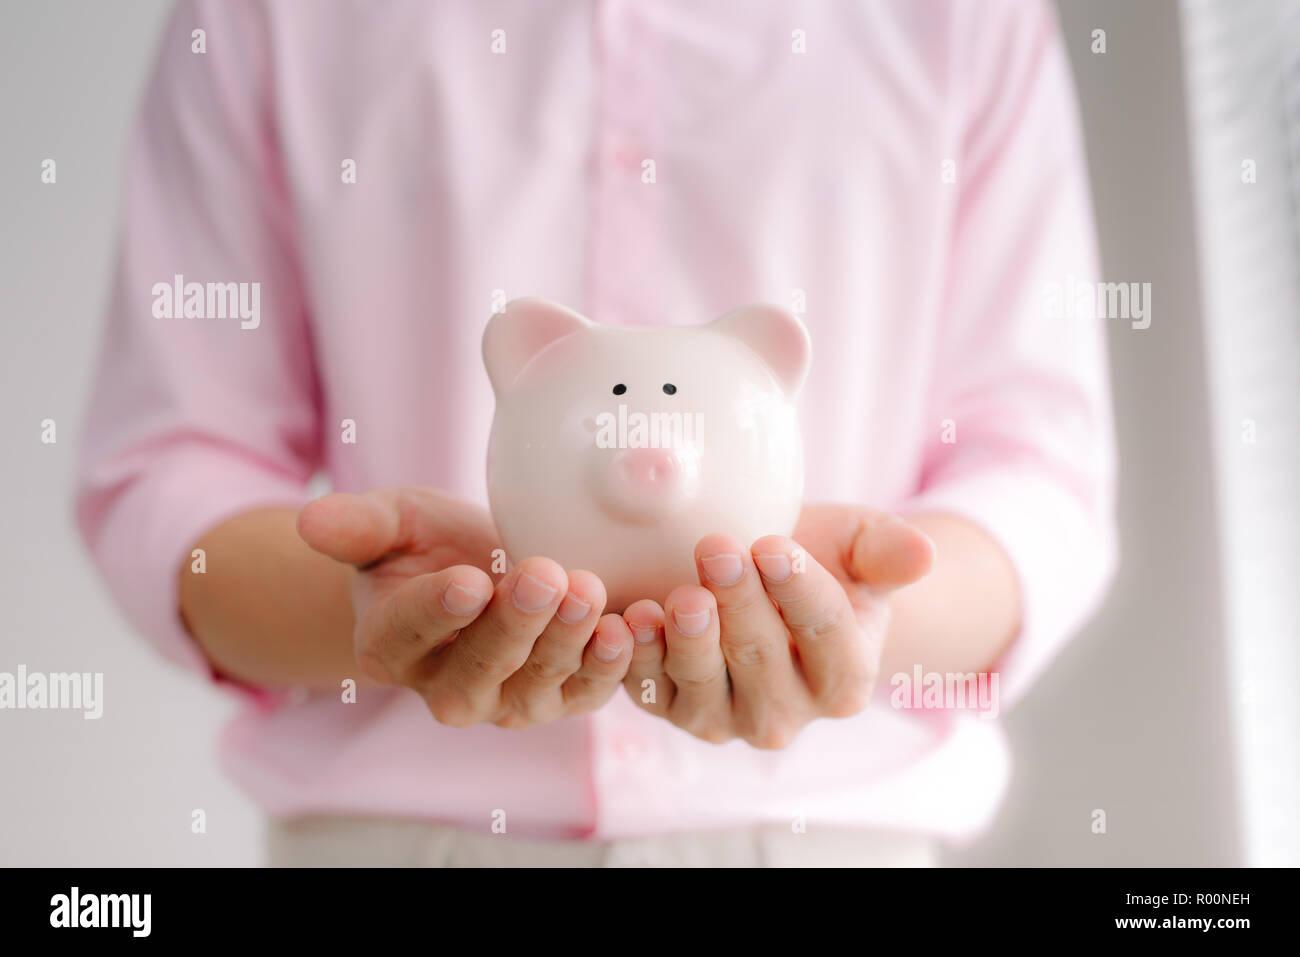 Man Hands Holding Big Pink Piggy Bank Stock Photo 223751657